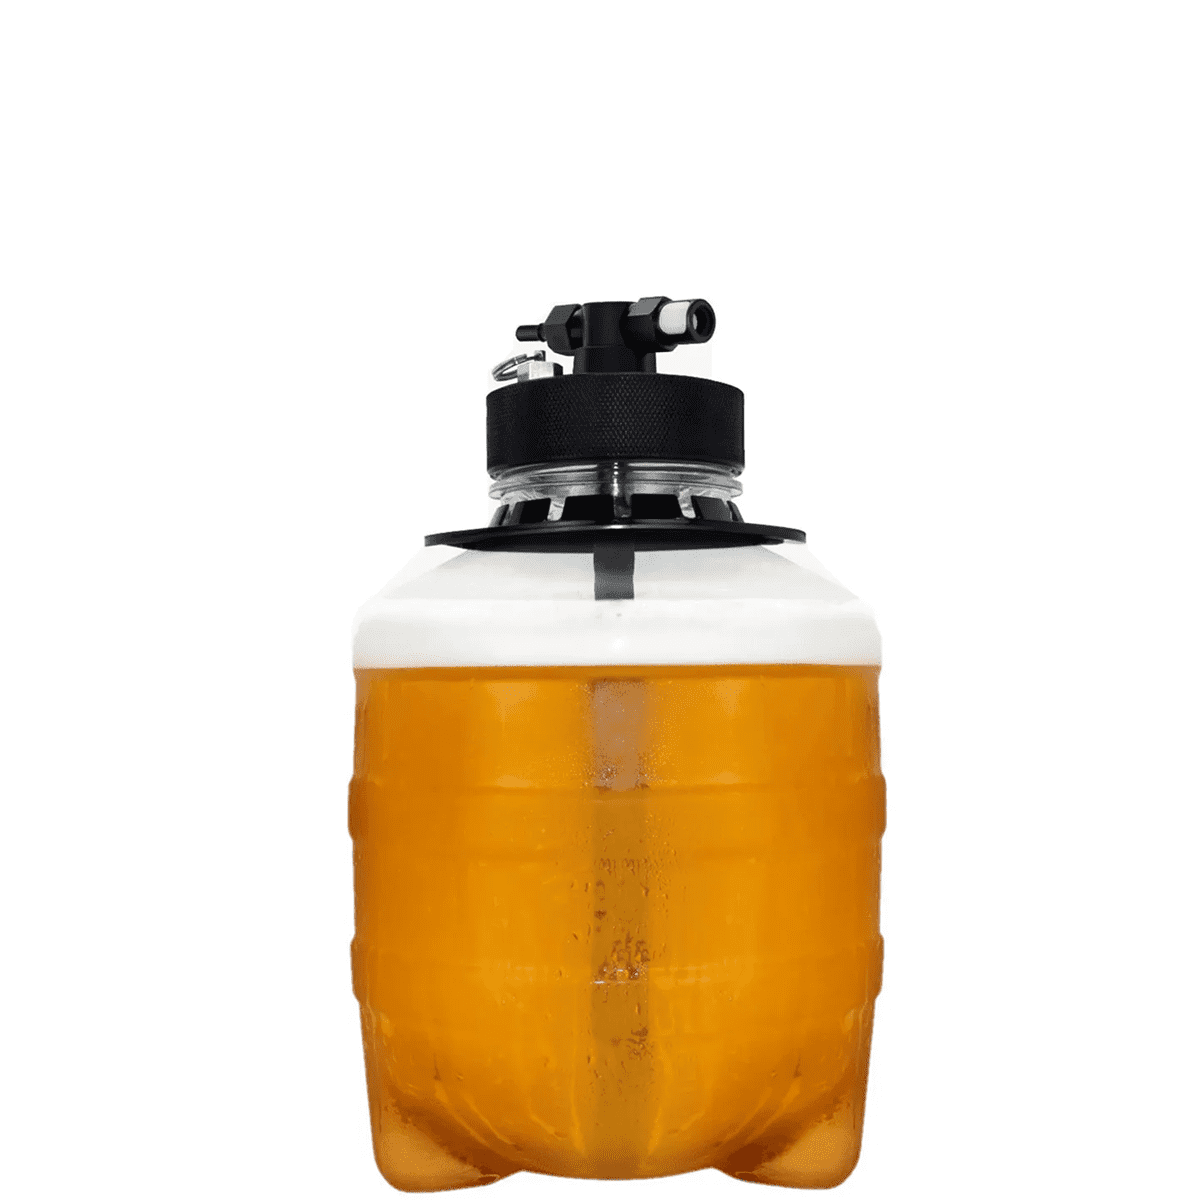 Barril De Chopp 3,8 Litros Benmax Para Chopeira Philco  - Ambientude Agro e Pet